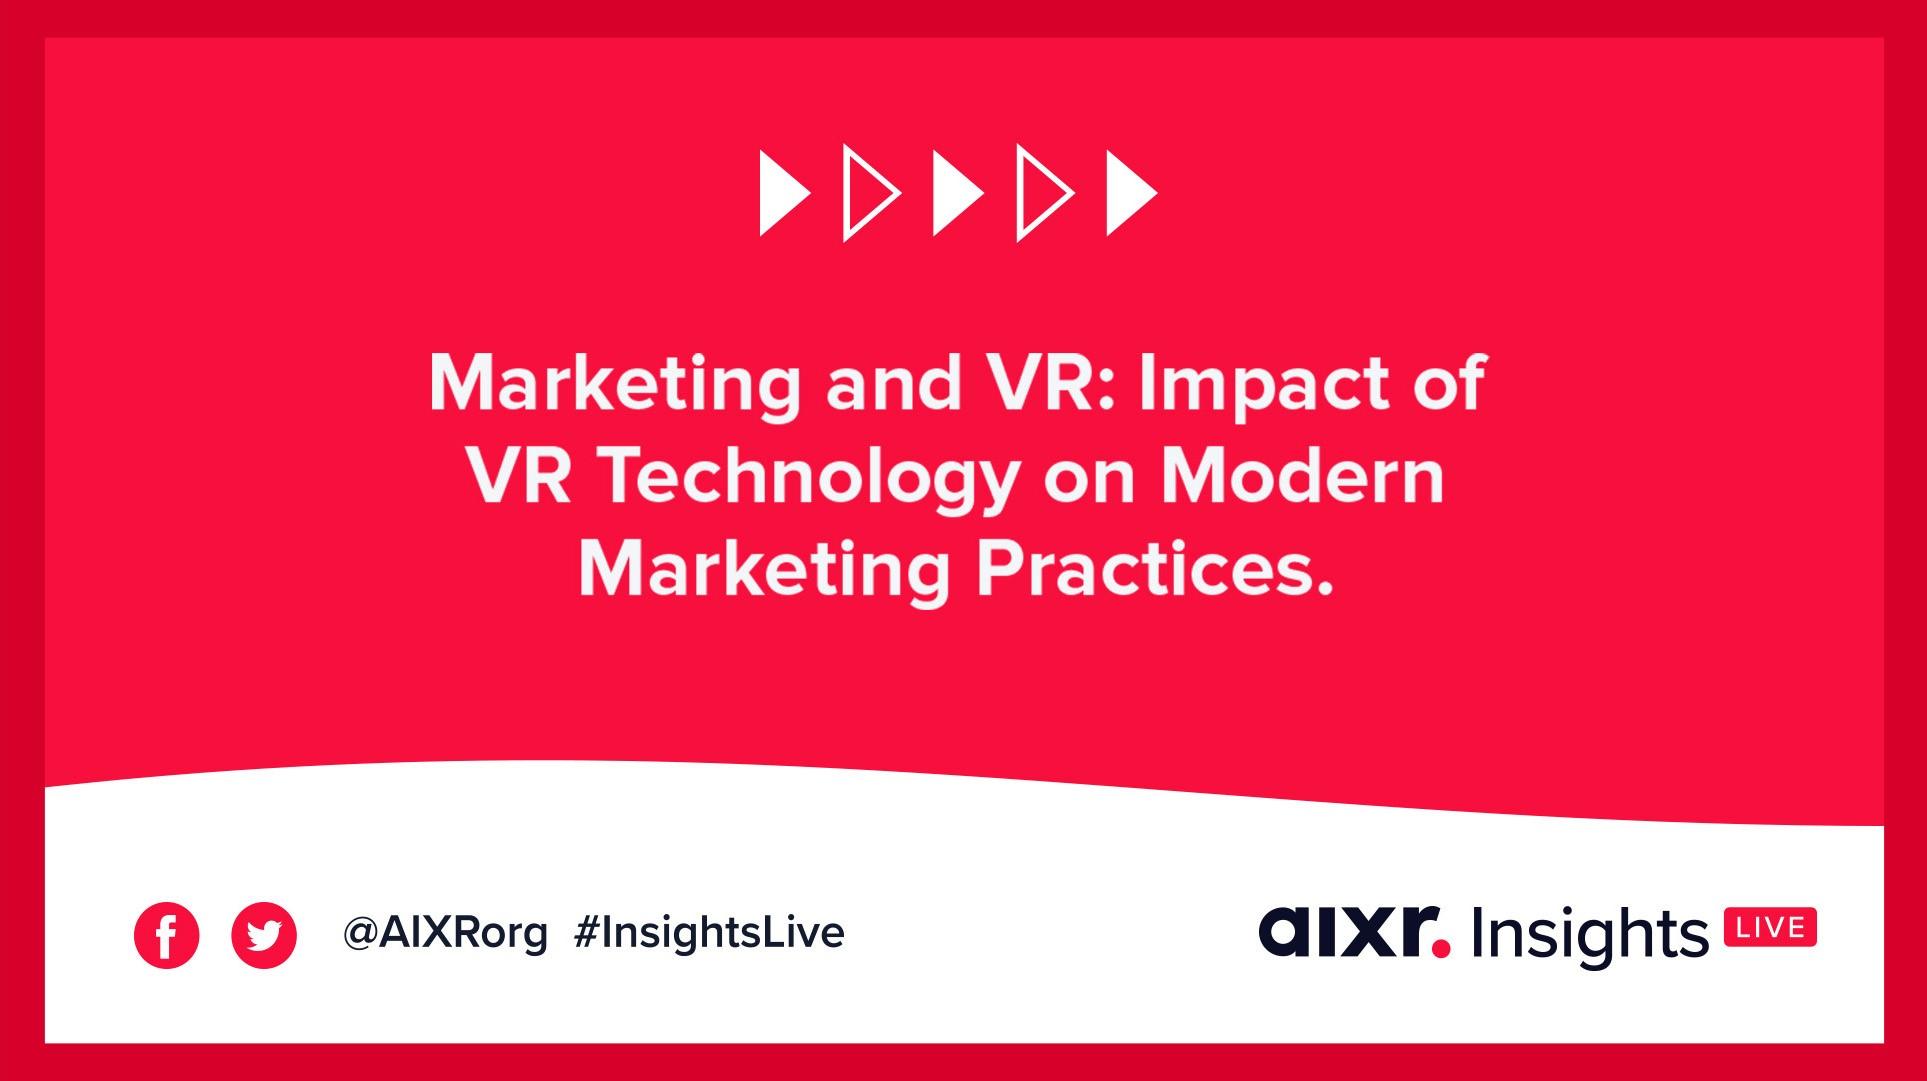 VR and Marketing AIXR Insights Live Webinar Banner